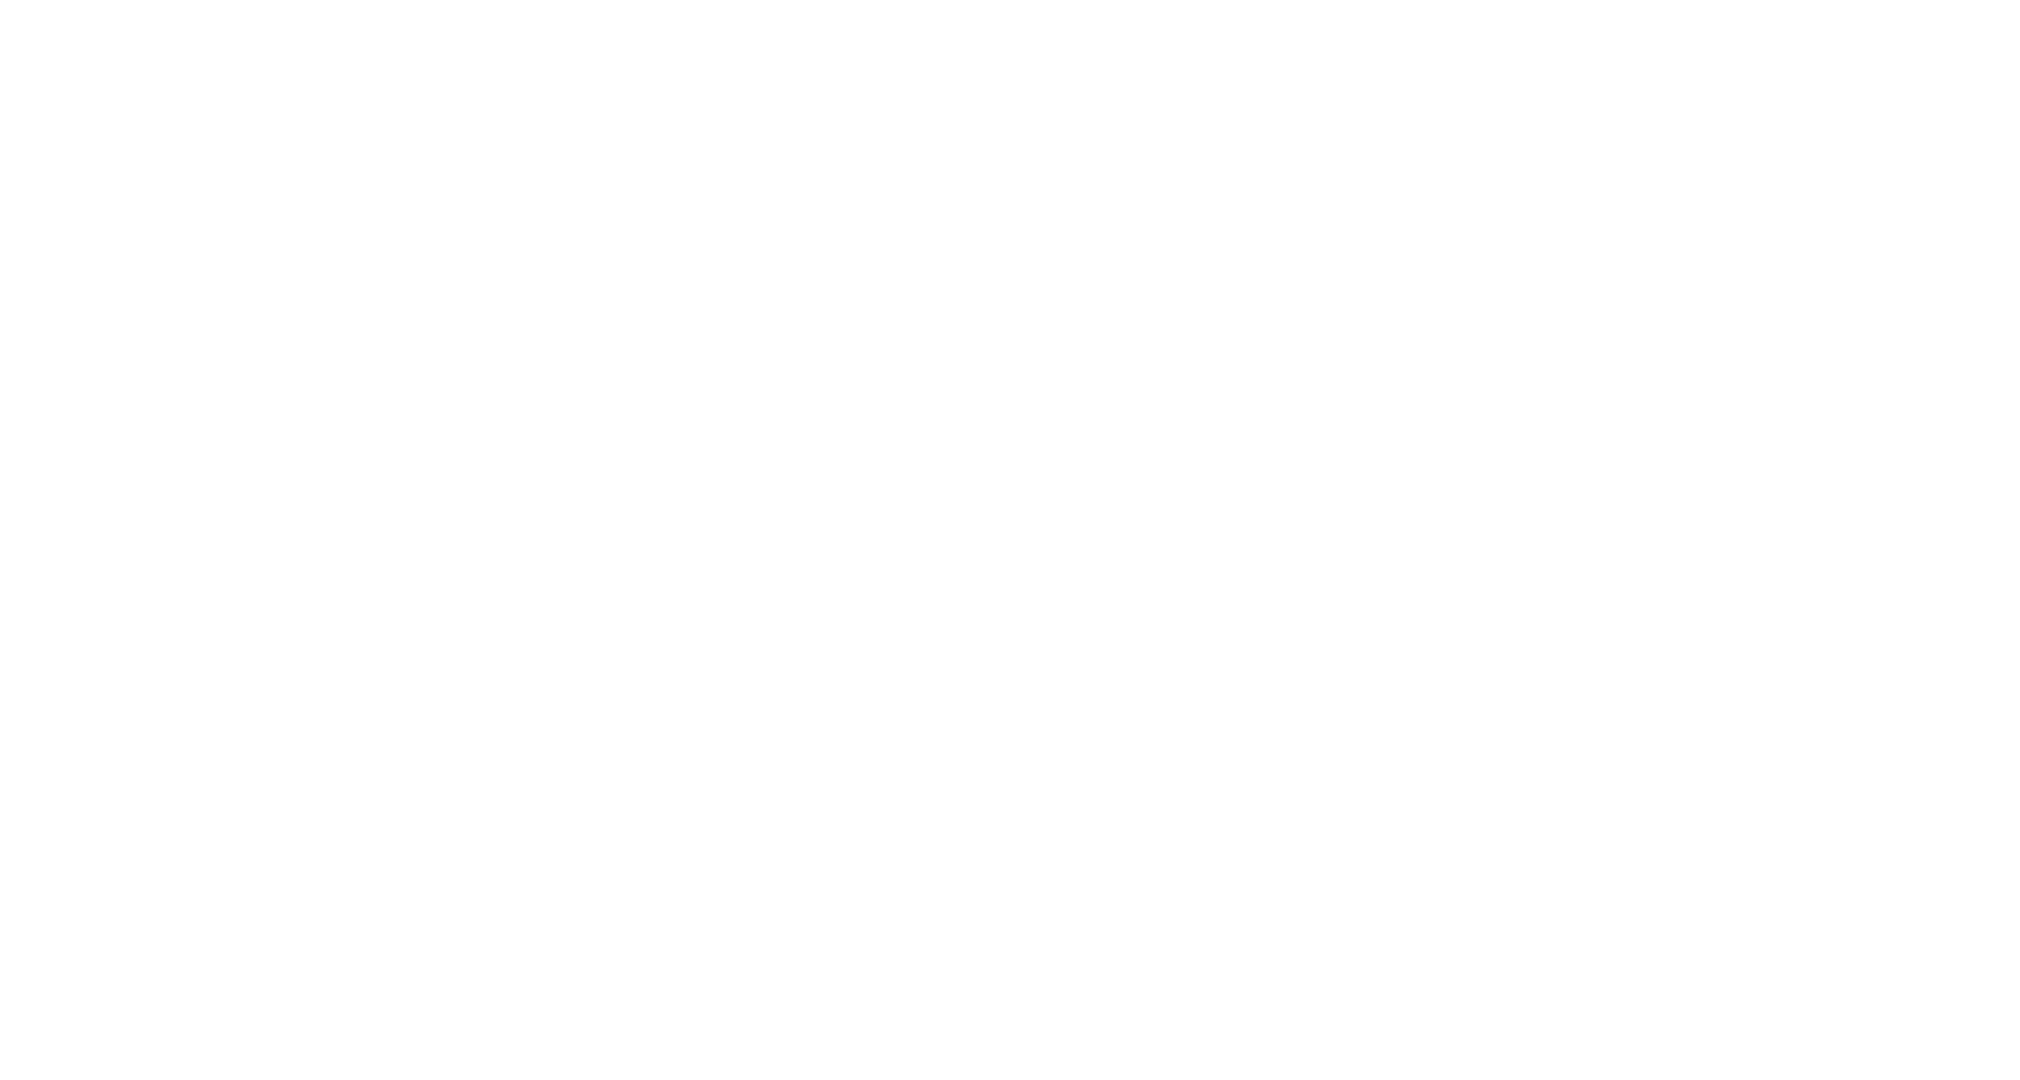 AutoTune_logo_Feb1-white.png